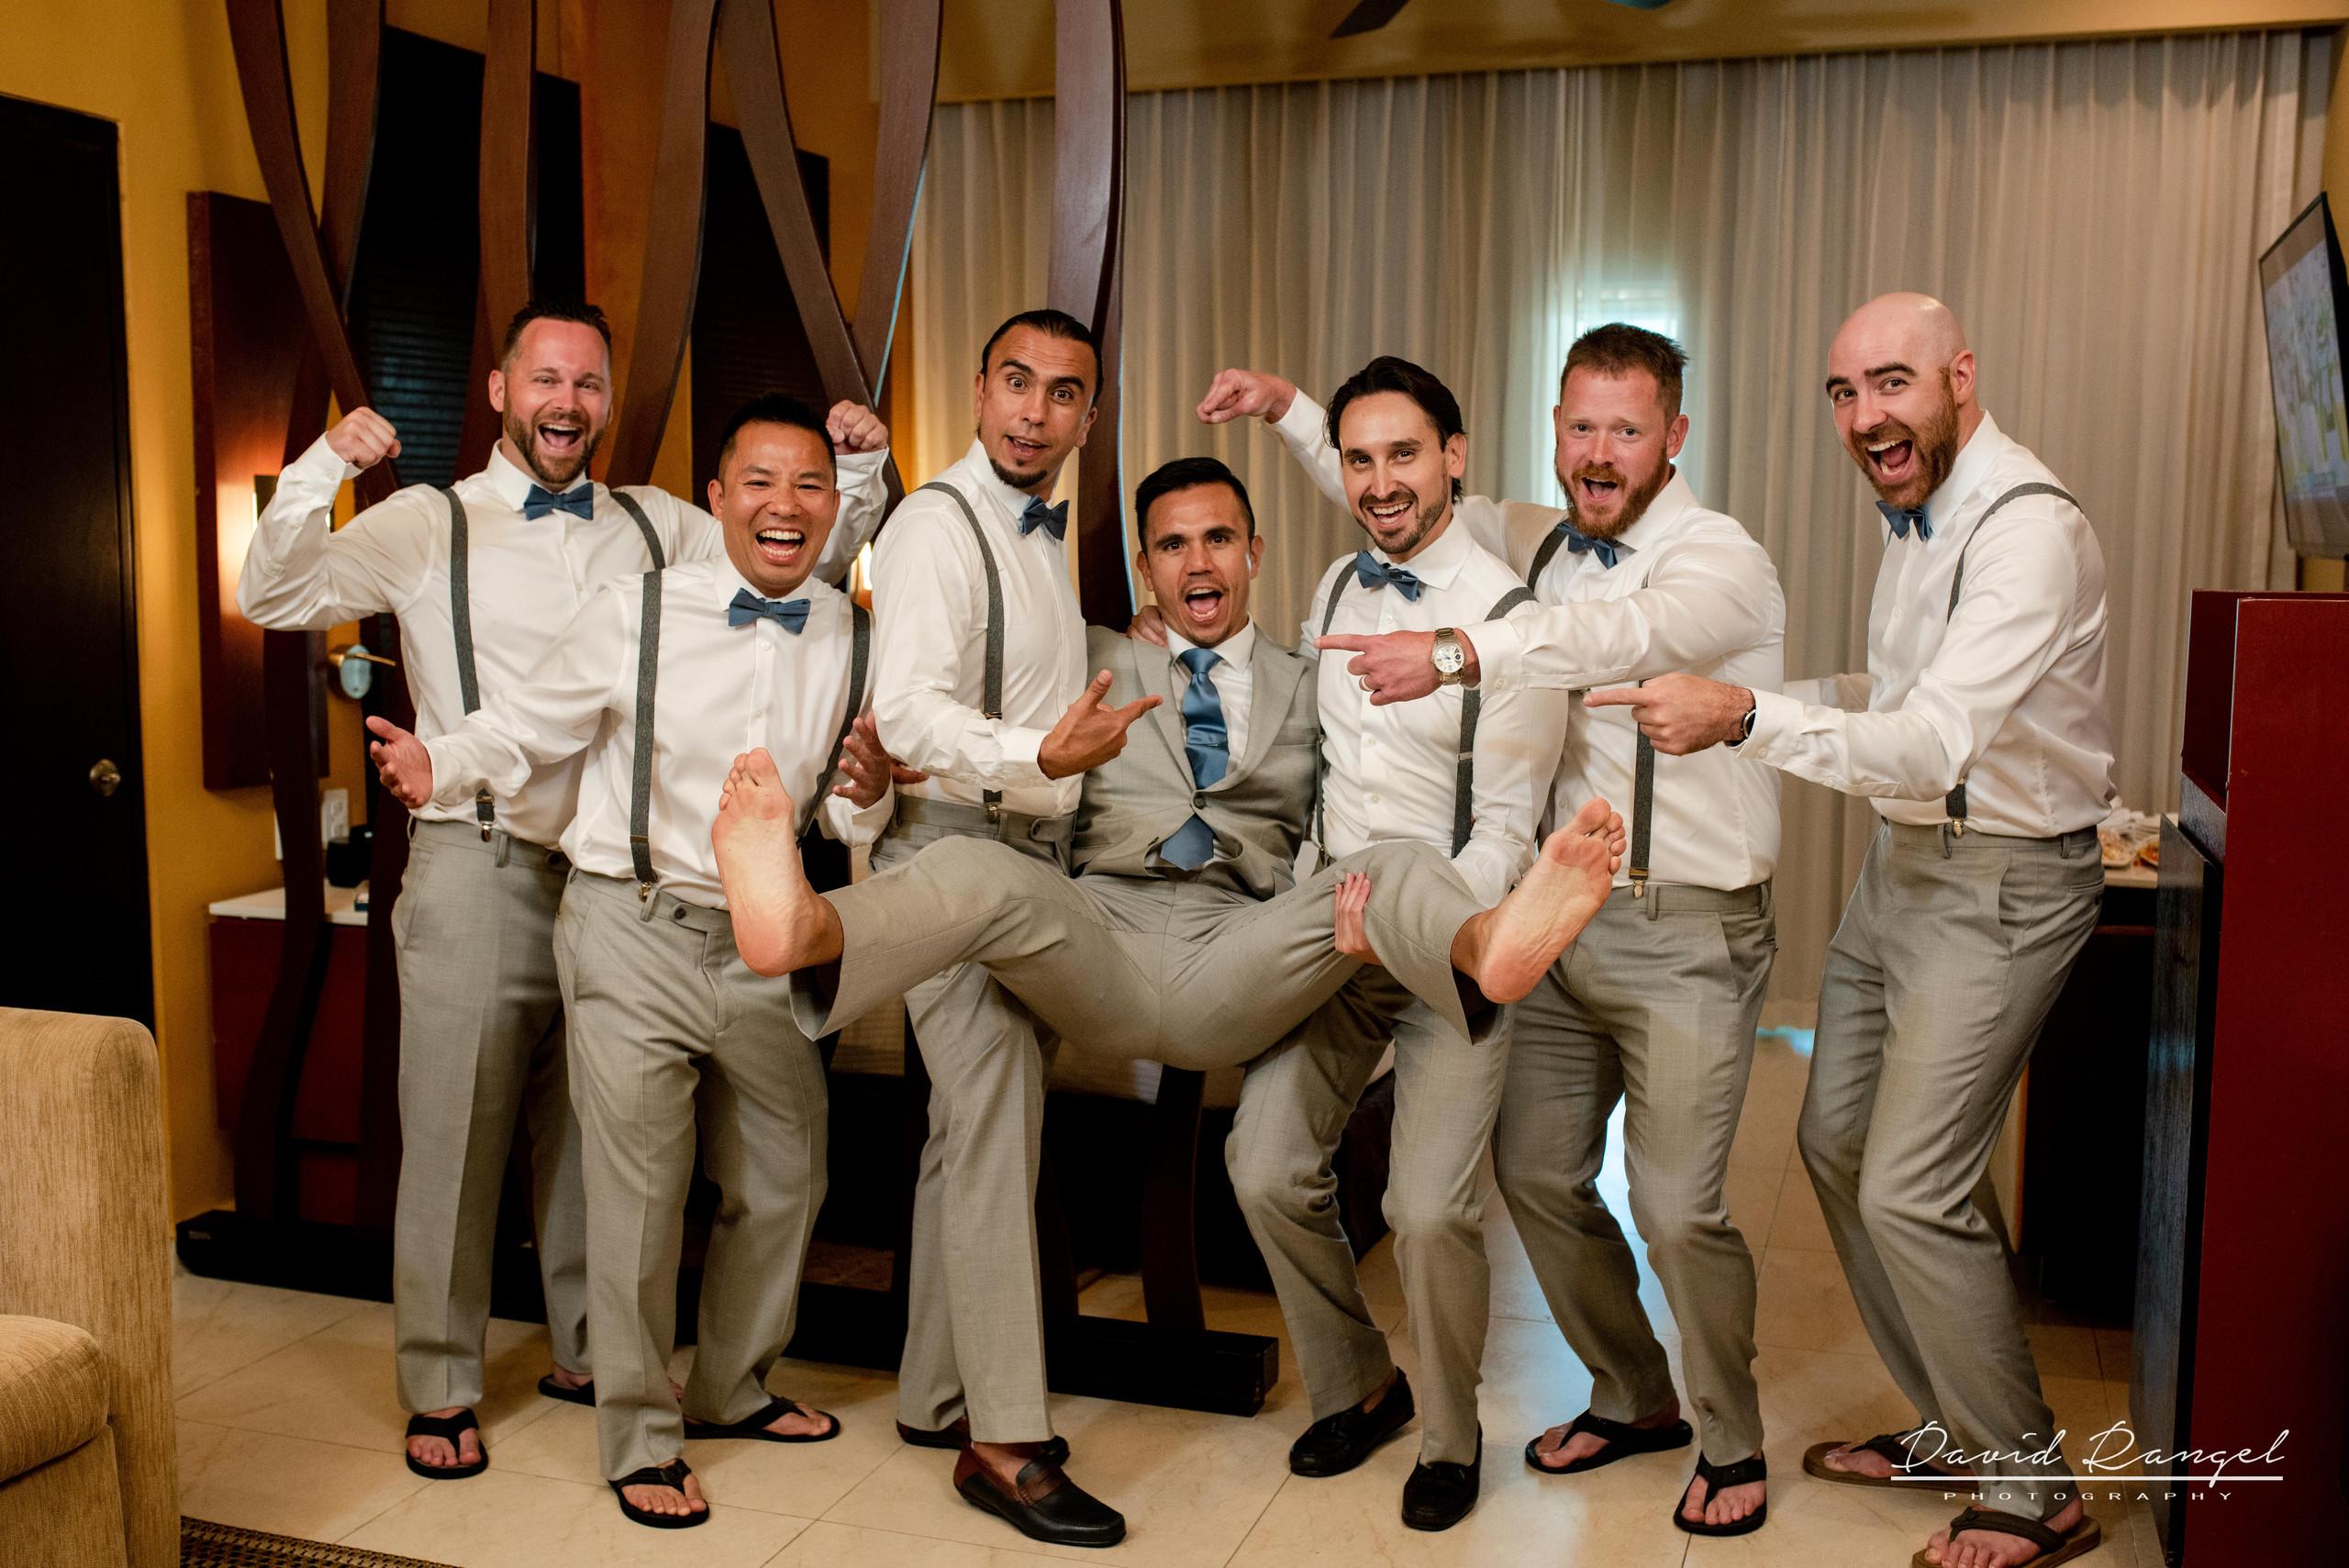 grooms+crue+getting+ready+photo